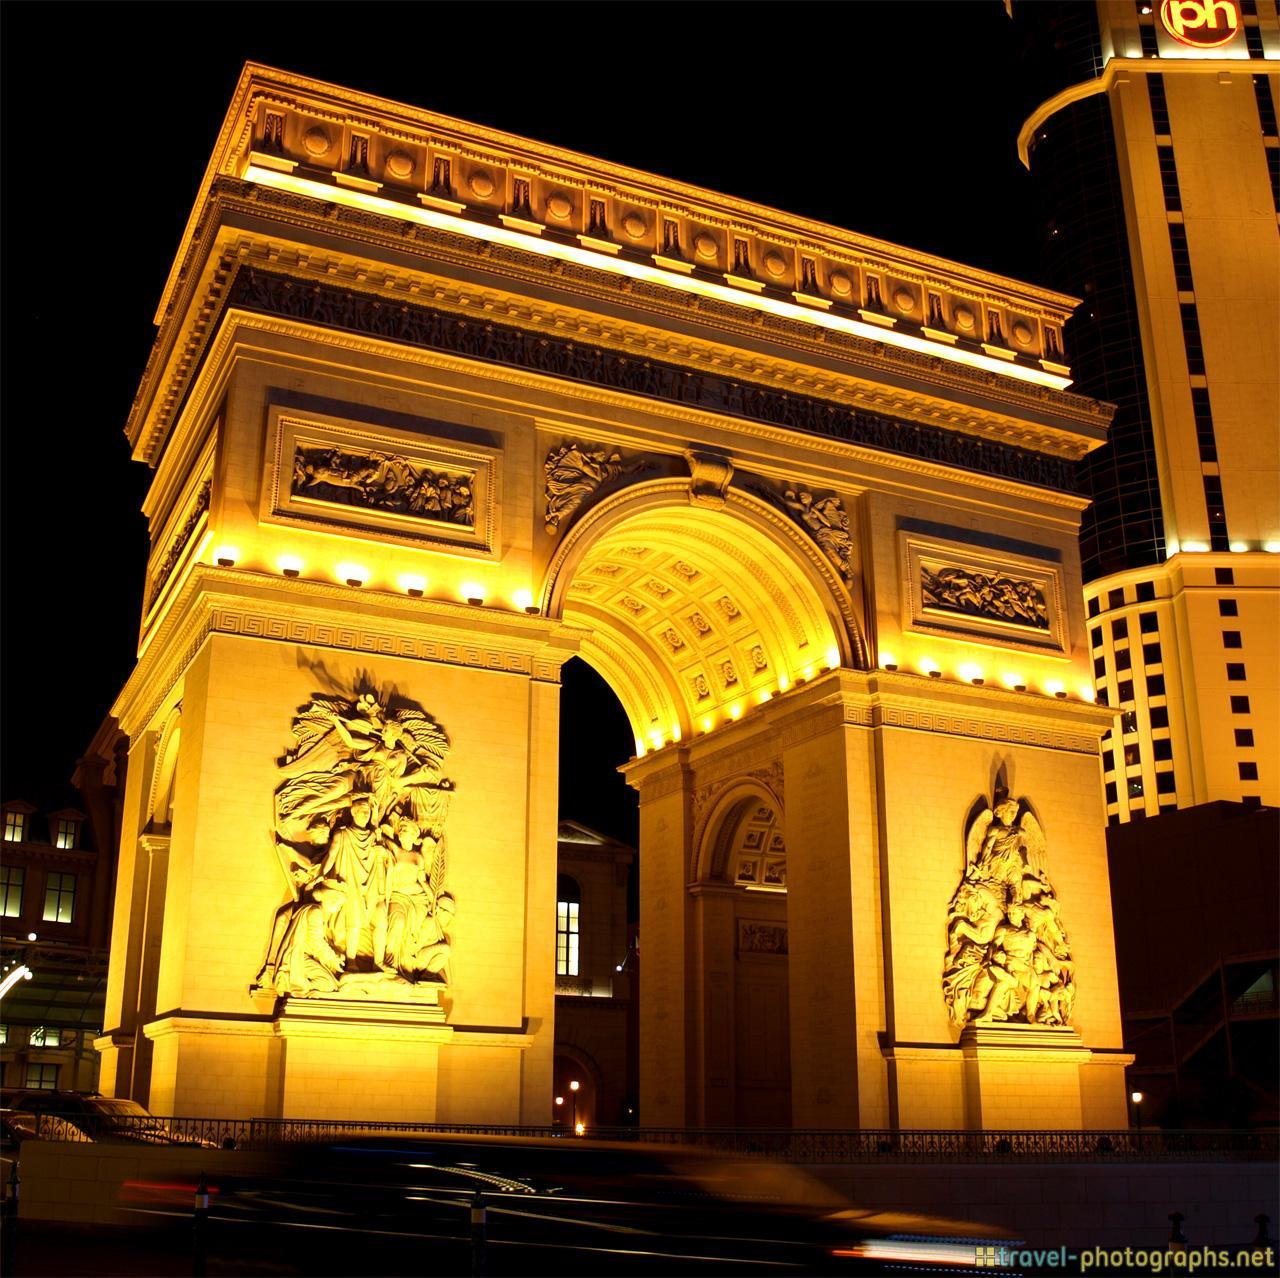 las-vegas-photos-hotel-paris-arc-triomphe